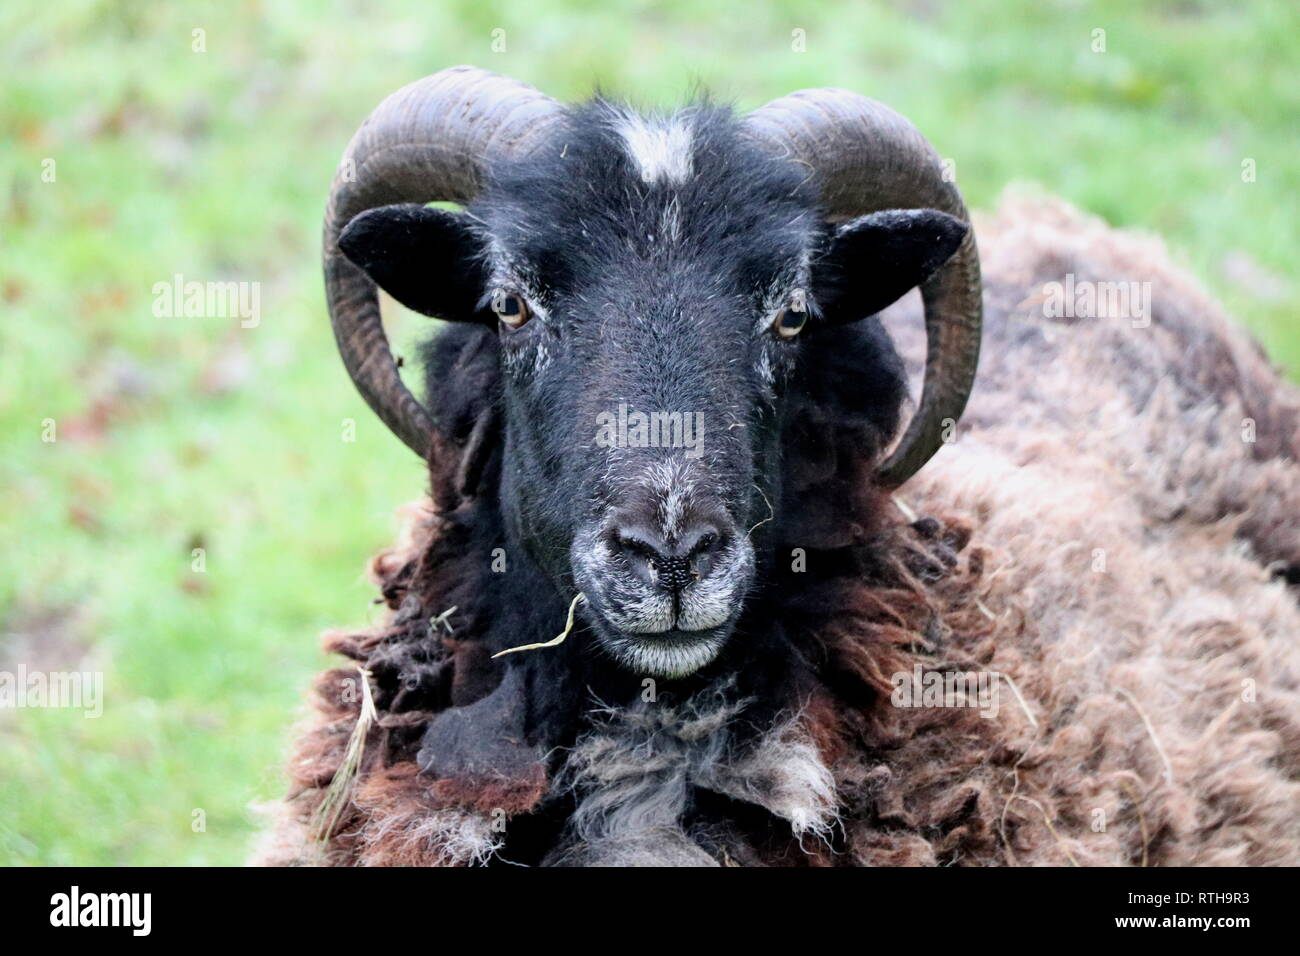 Horned Sheep - Stock Image